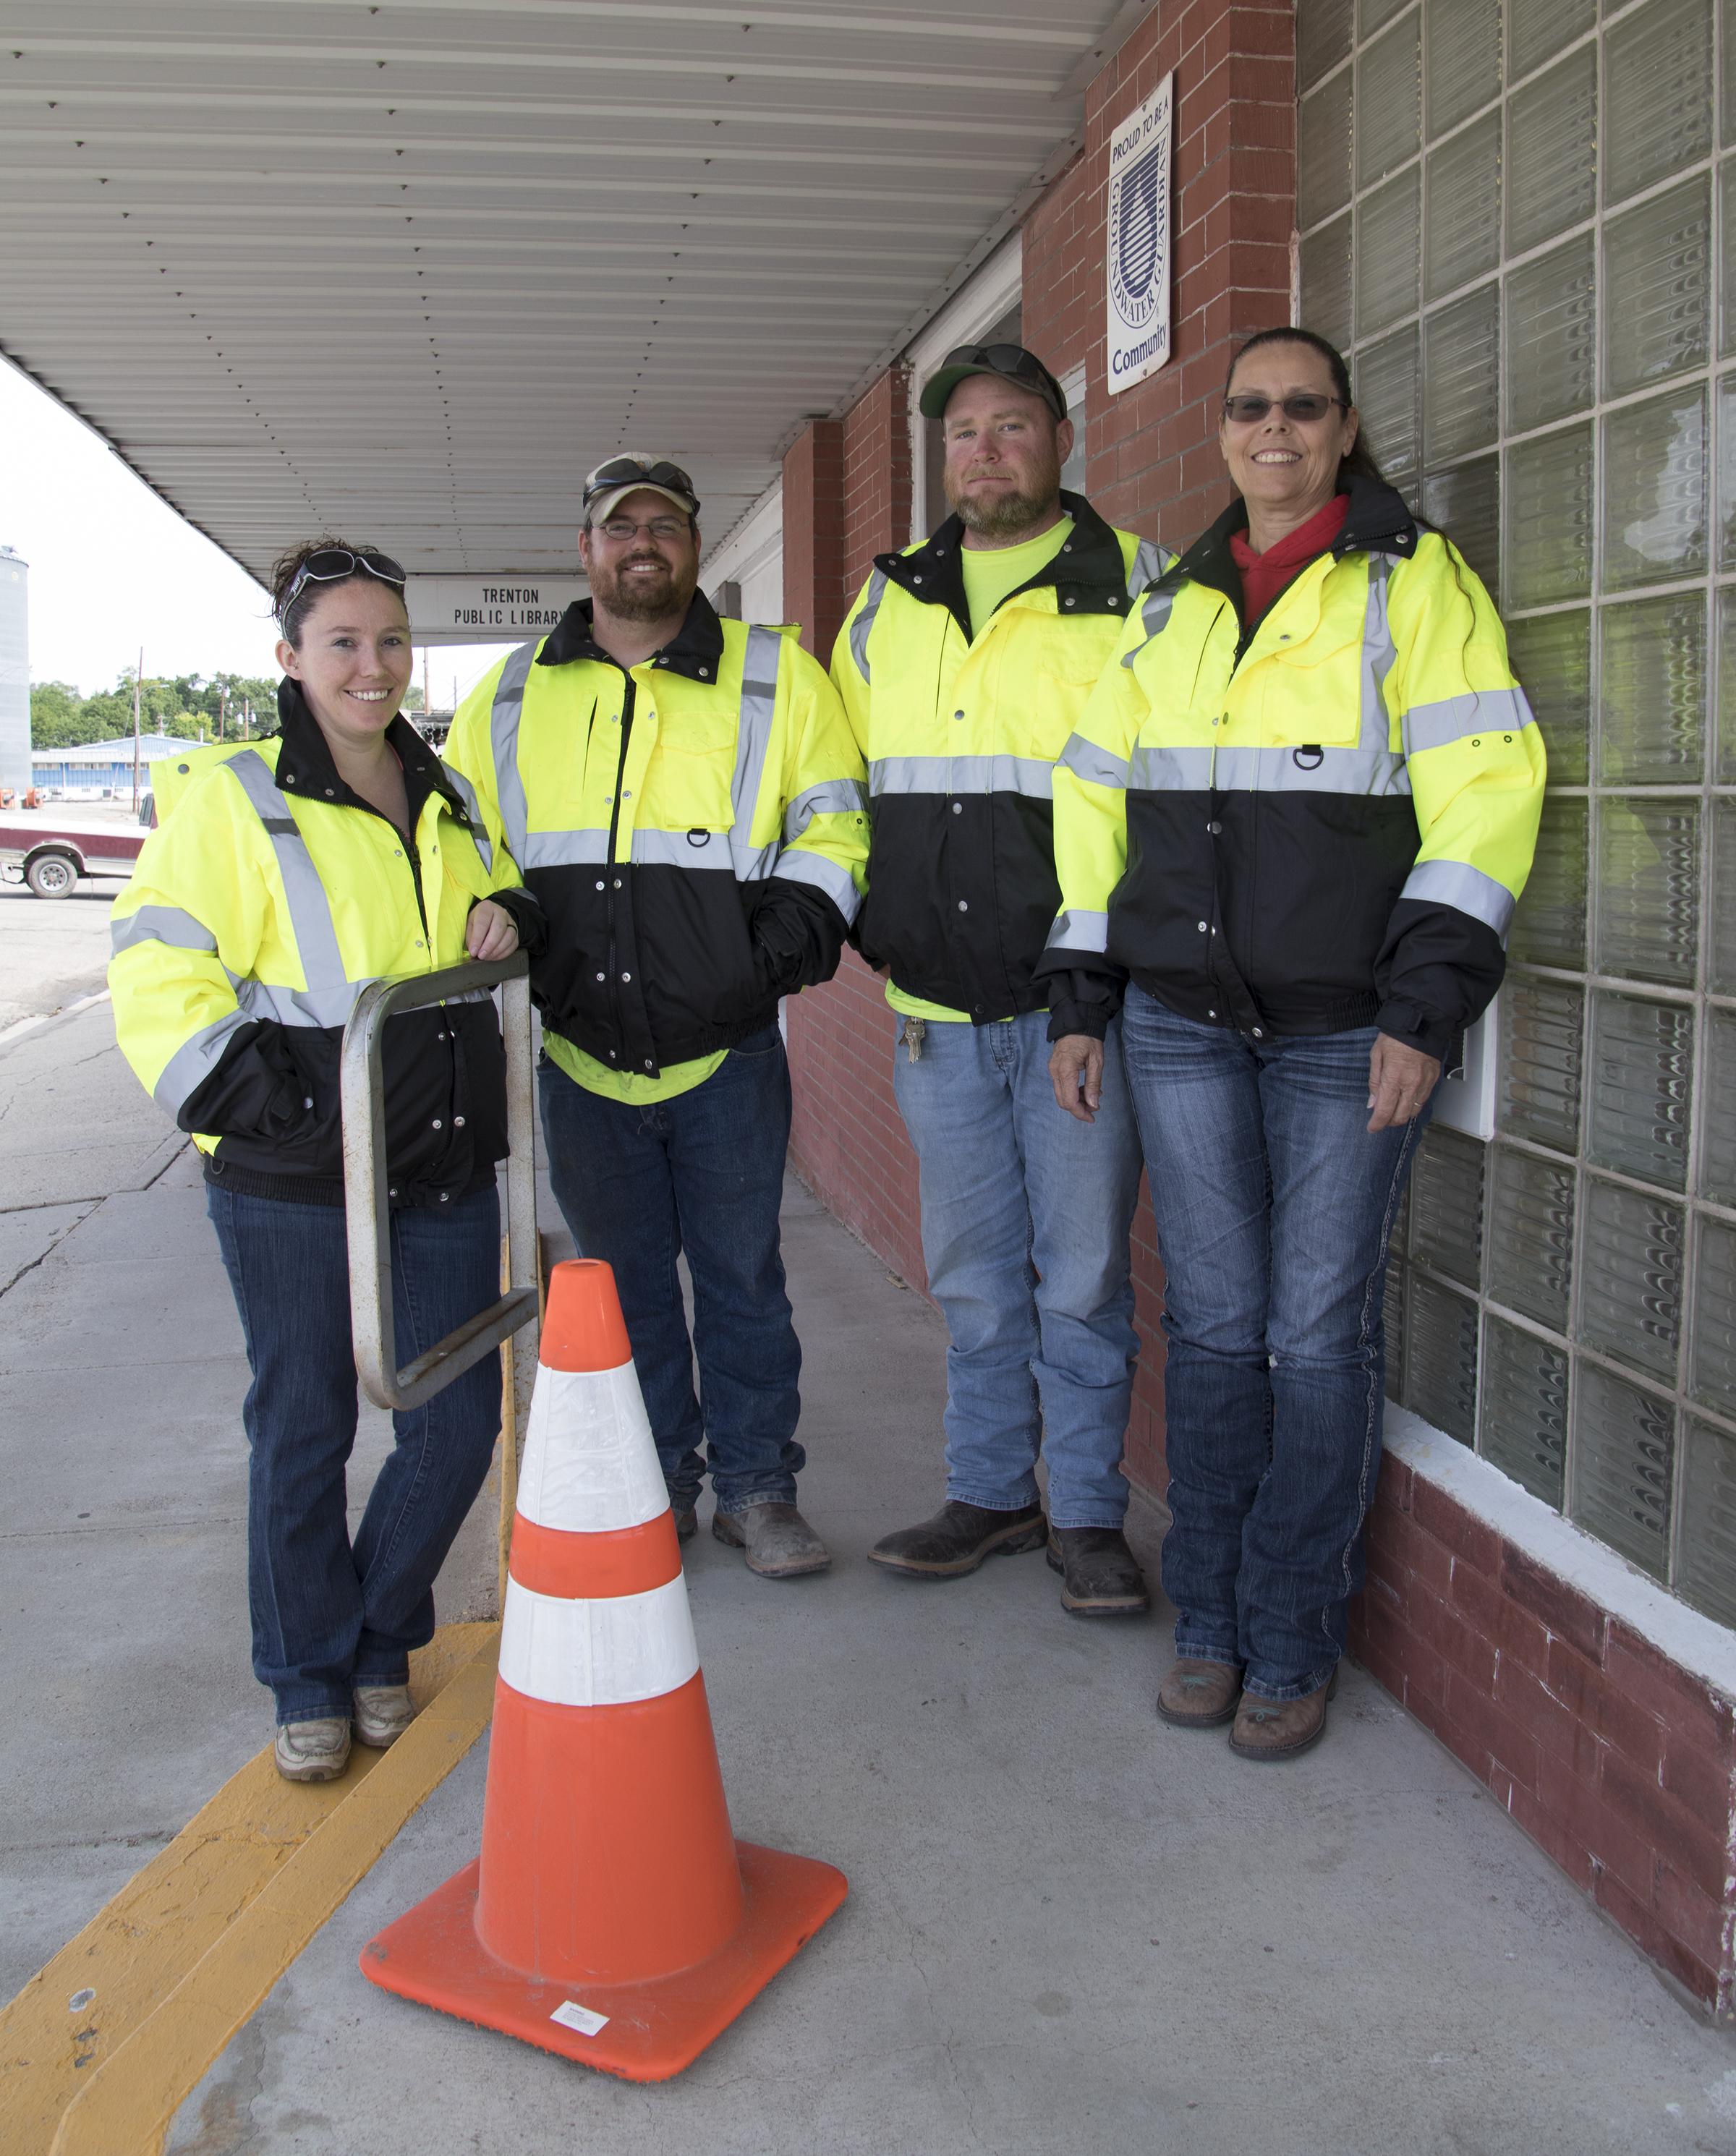 Trenton awarded Safety Grant